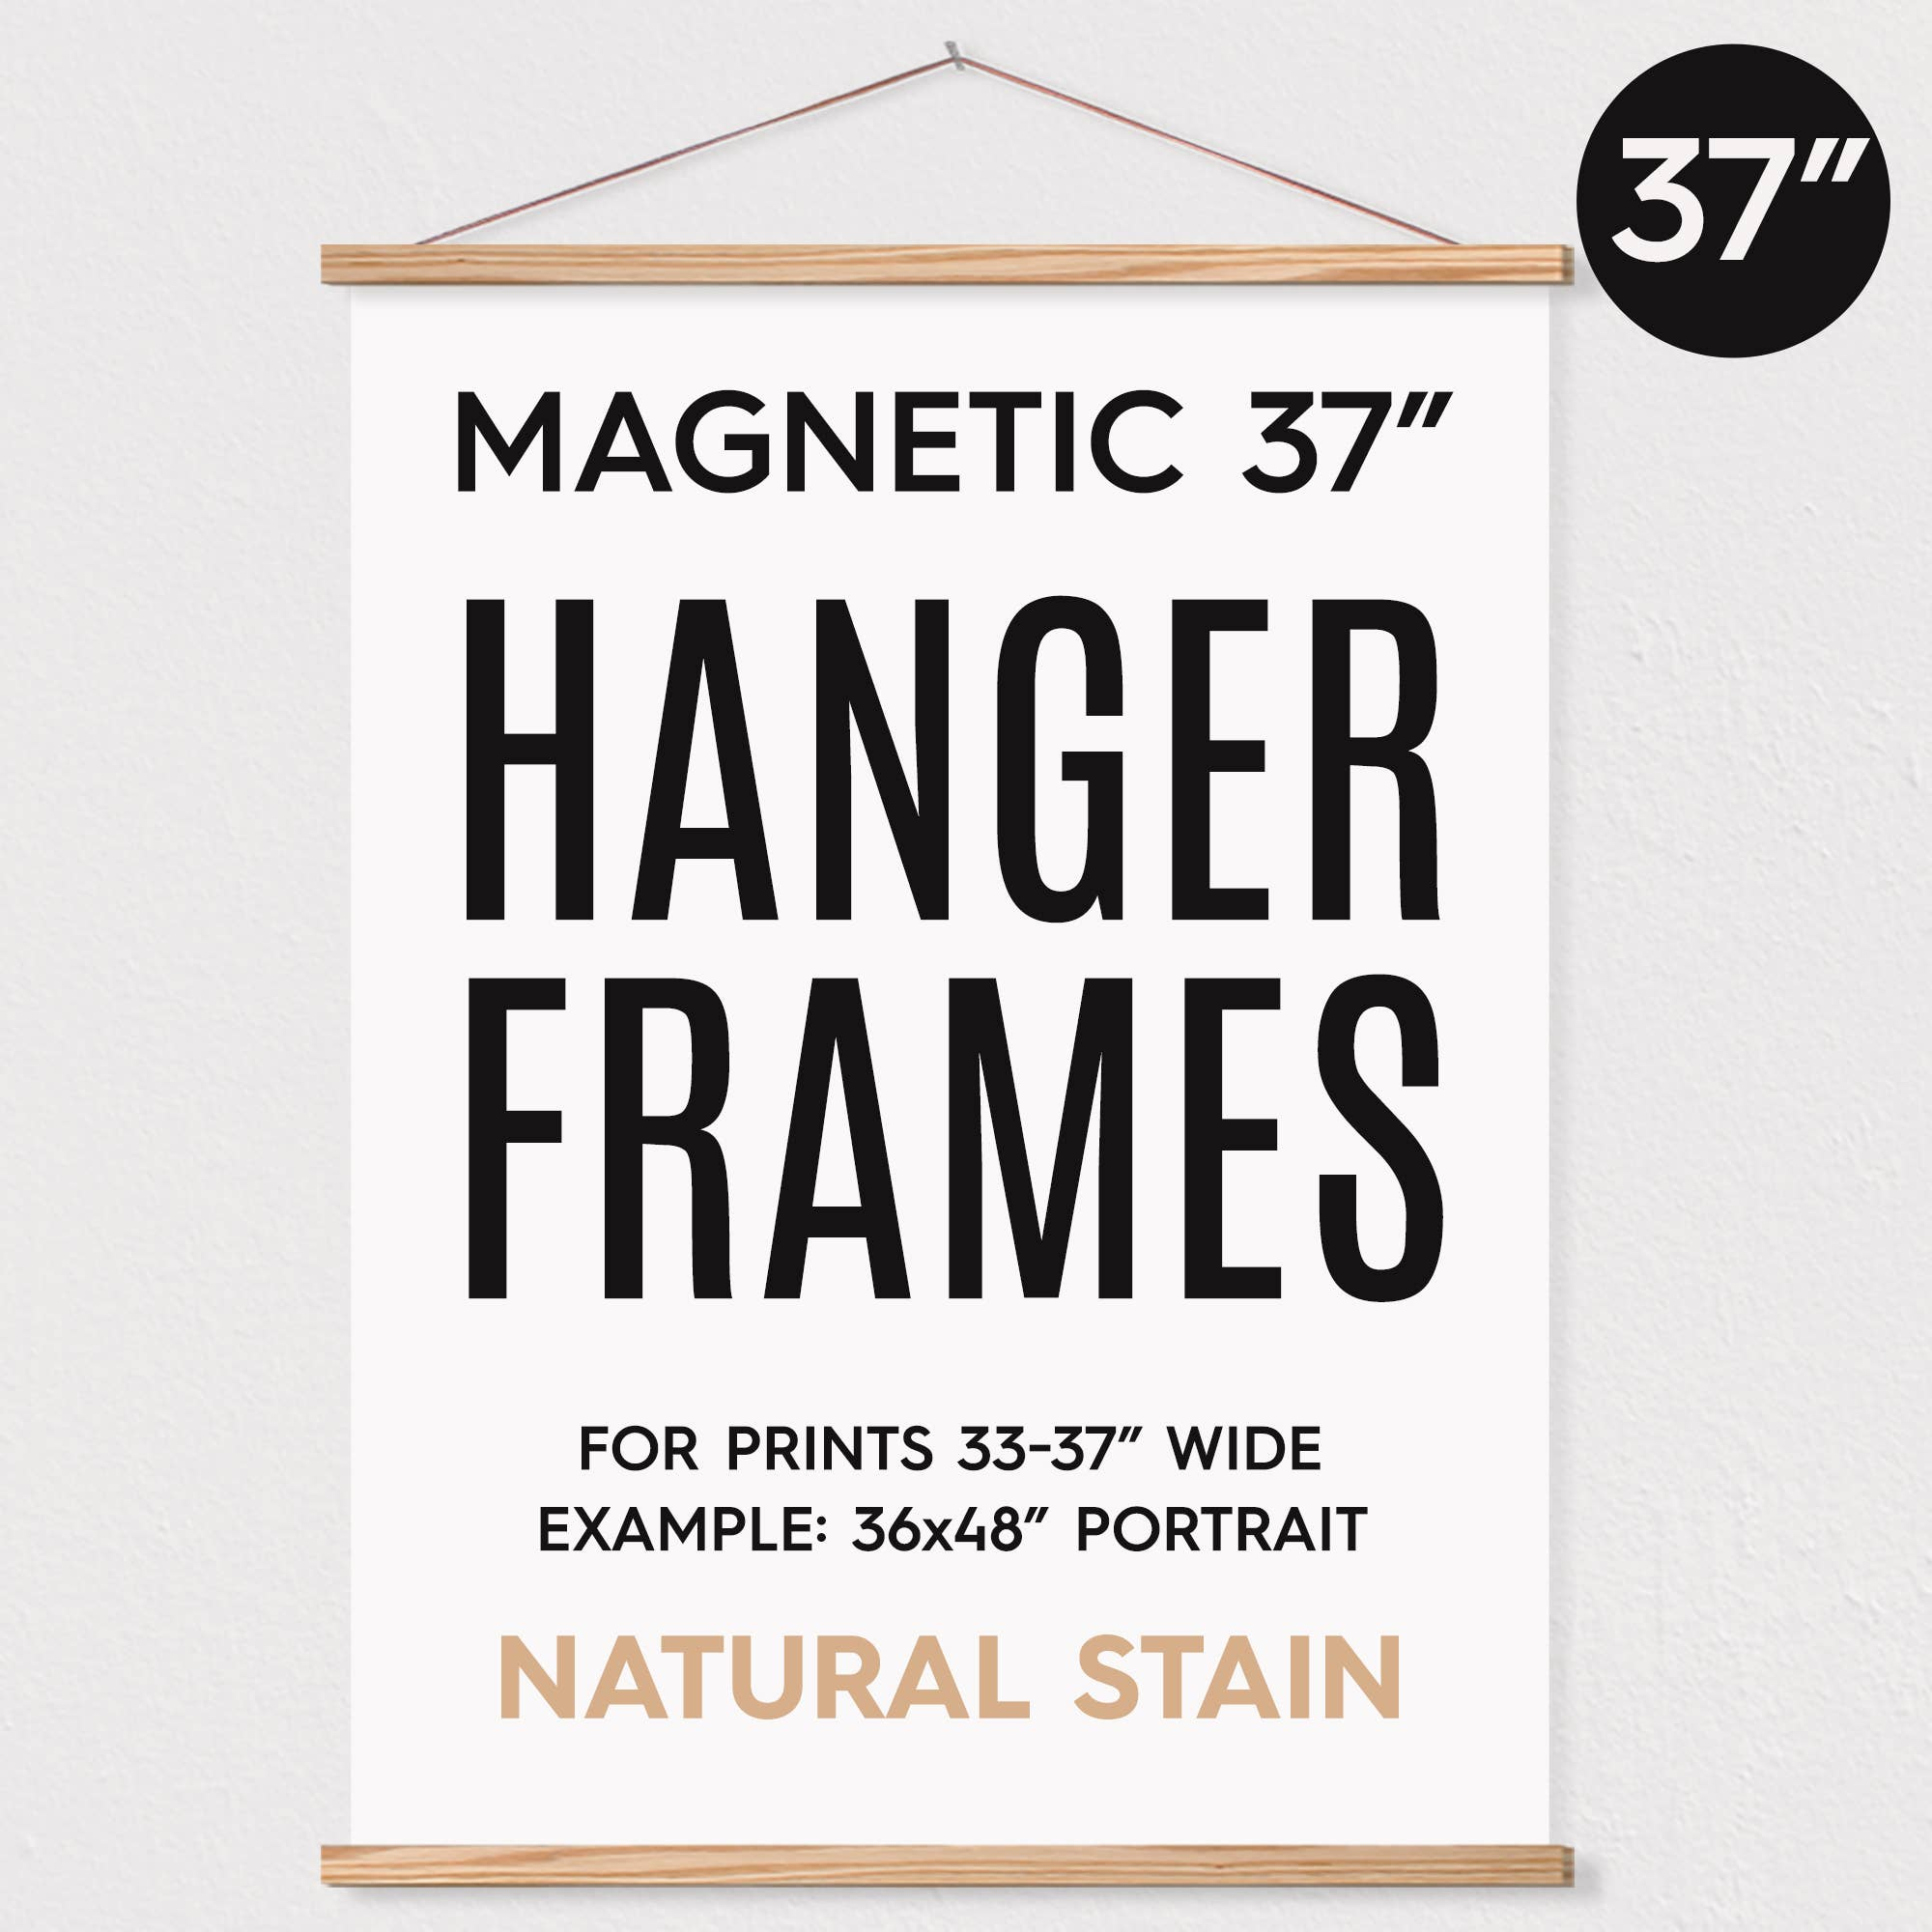 "37"" MAGNETIC Poster Hanger Frame for 36x48"" Portrait Prints   Trada Marketplace"